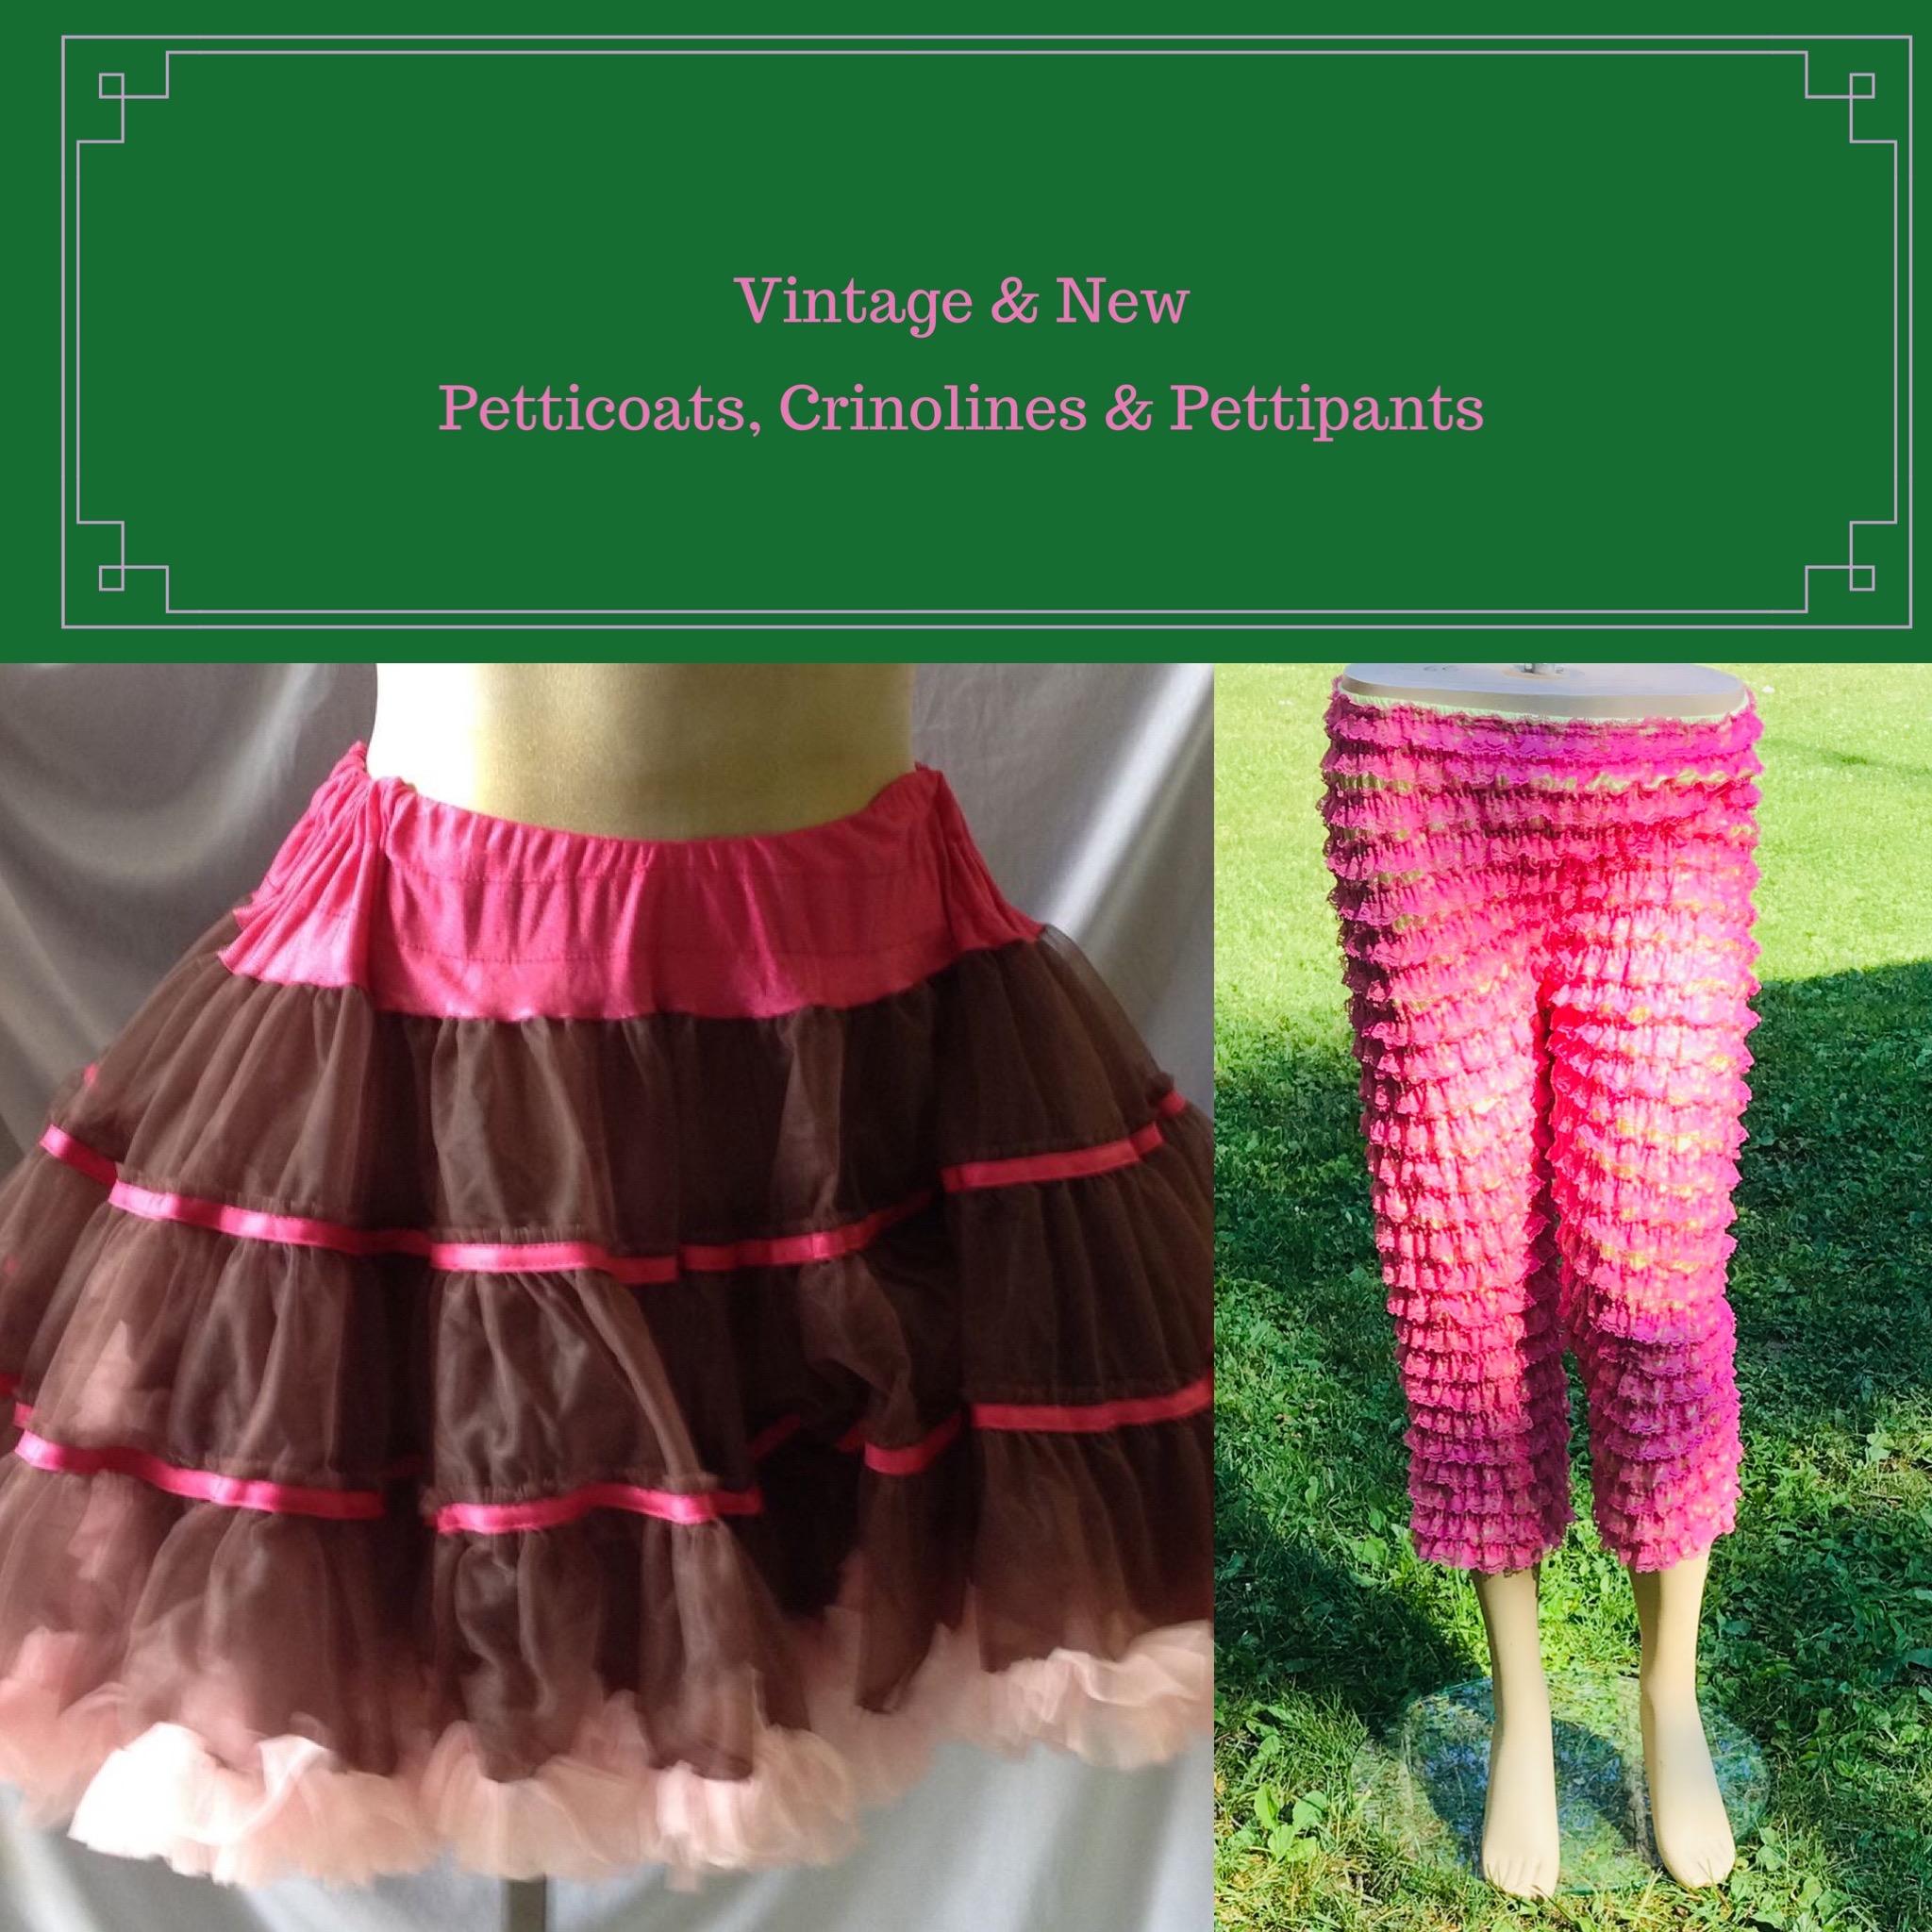 Petticoats, Crinolines & Pettipants